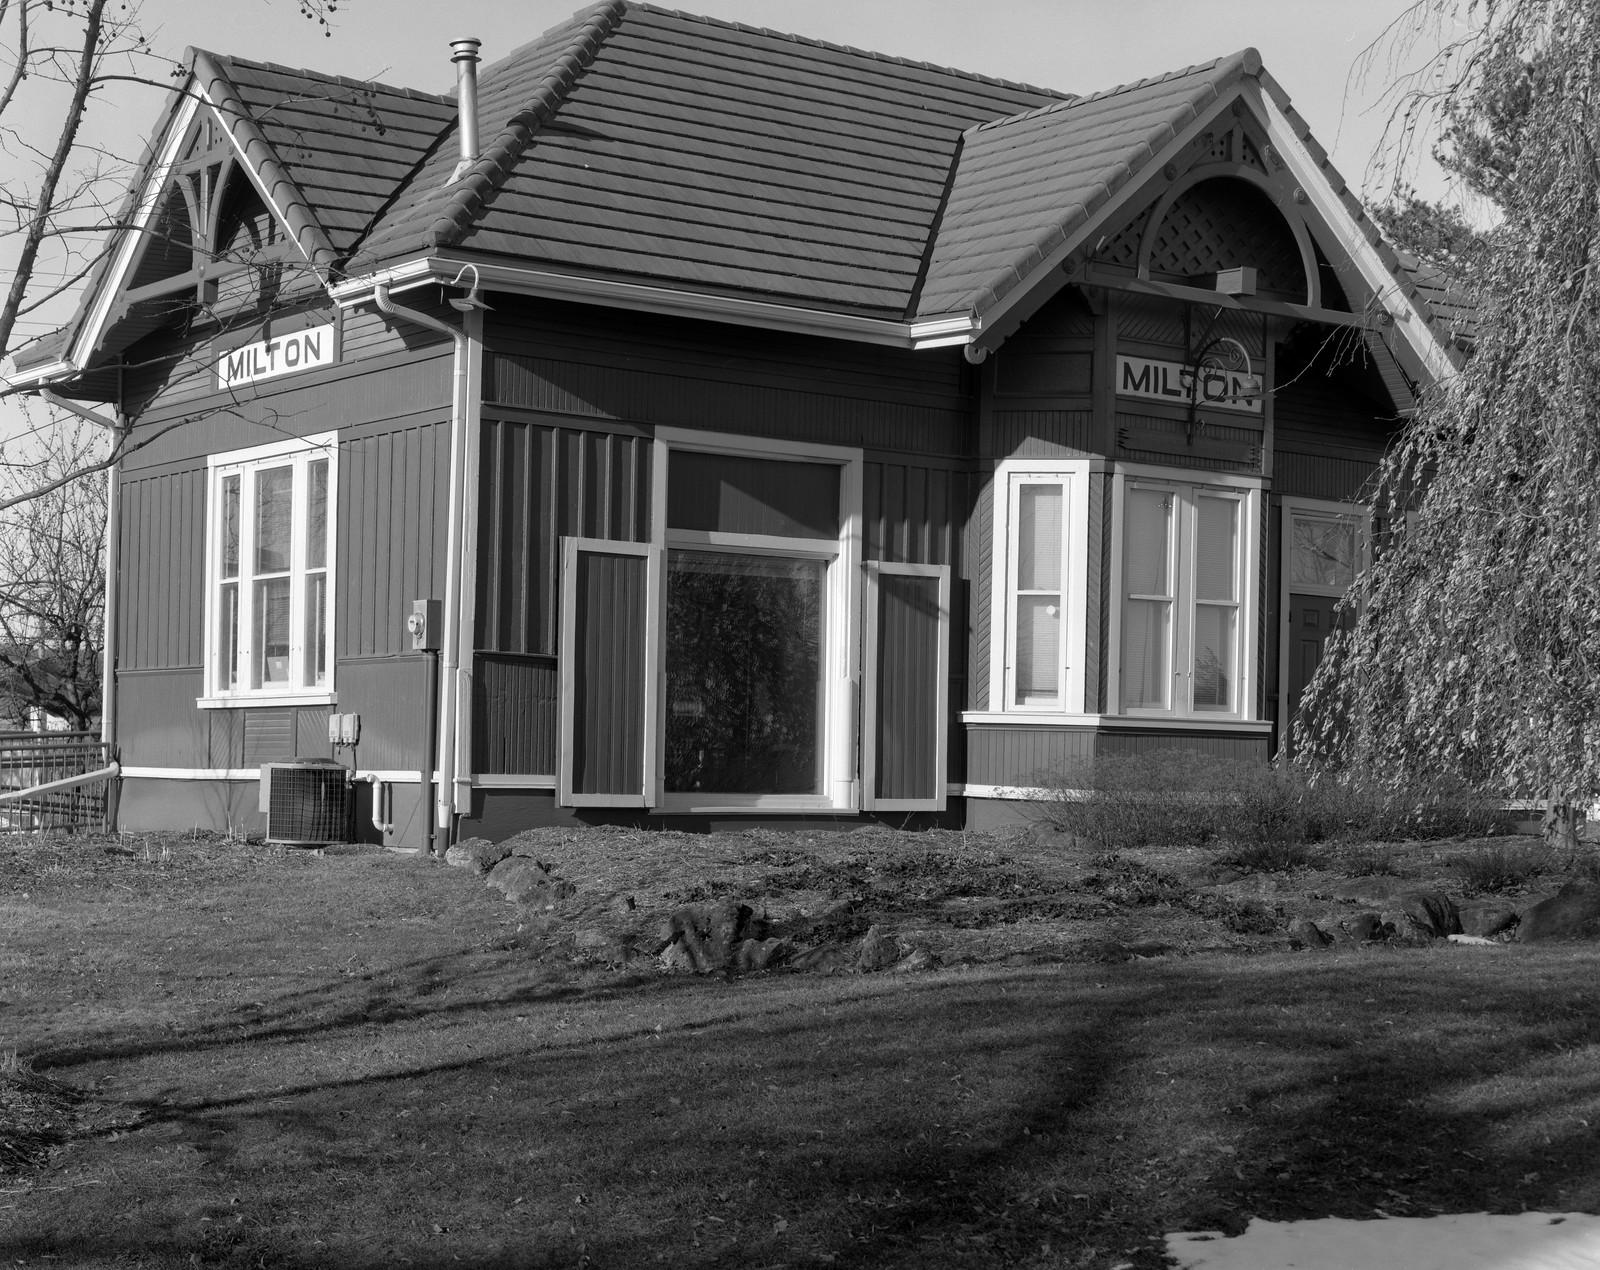 HomeTown - 11 - The Railroad